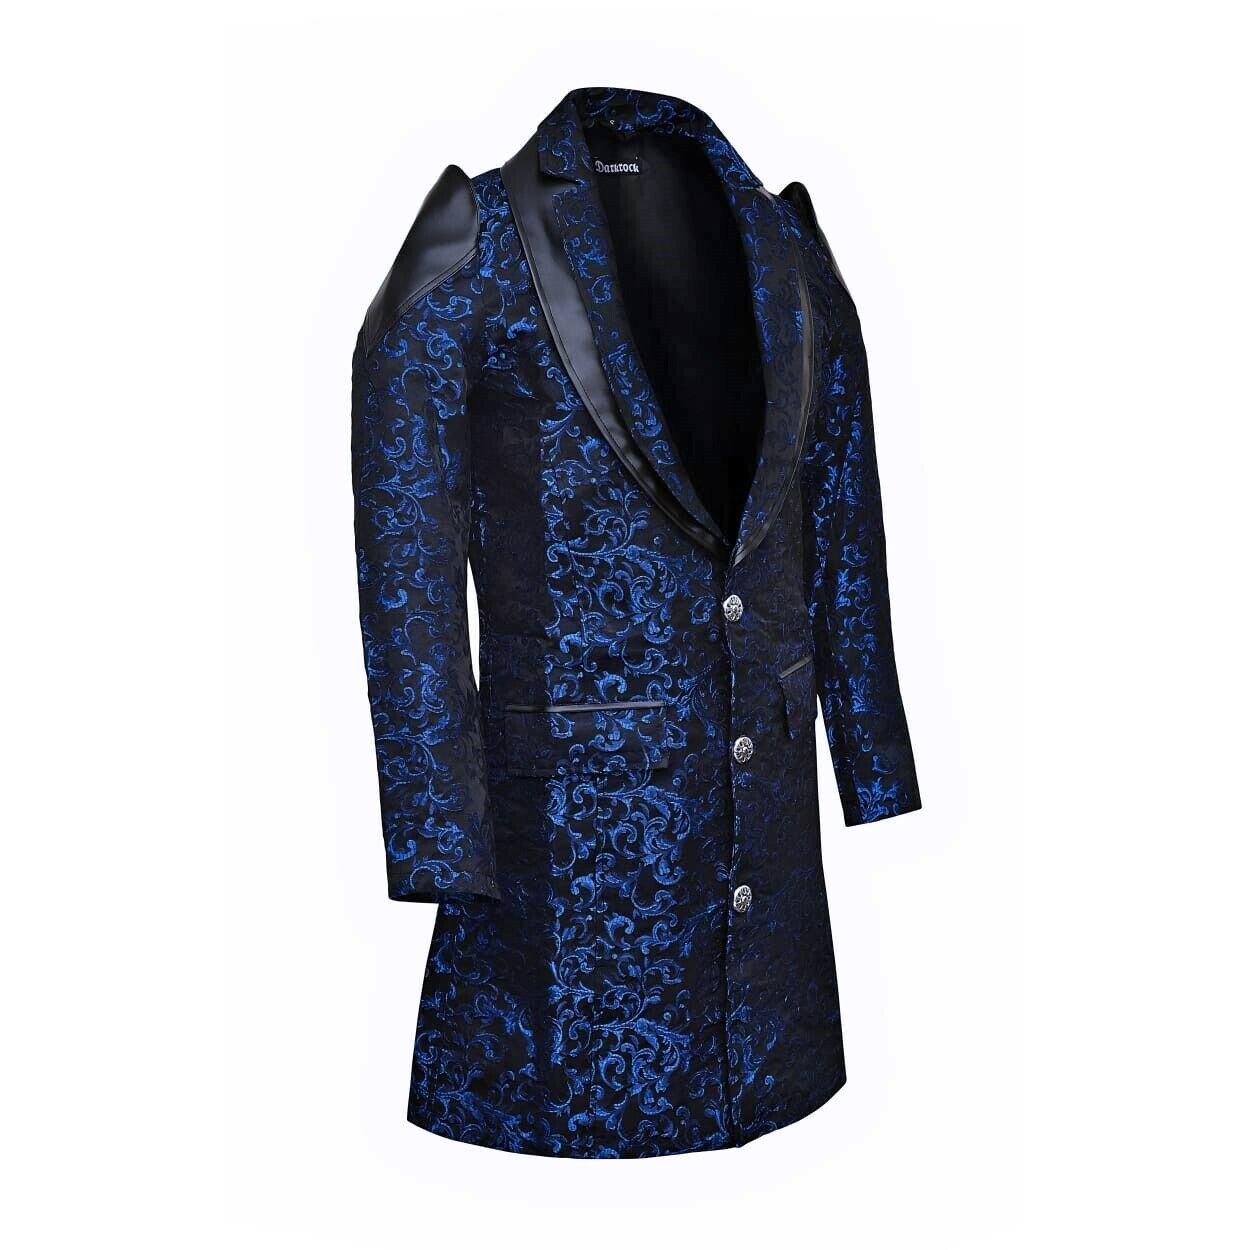 DARKROCK Men's Jacket Coat Blue Damask Gothic Steampunk VTG Aristocrat faux leather (1)